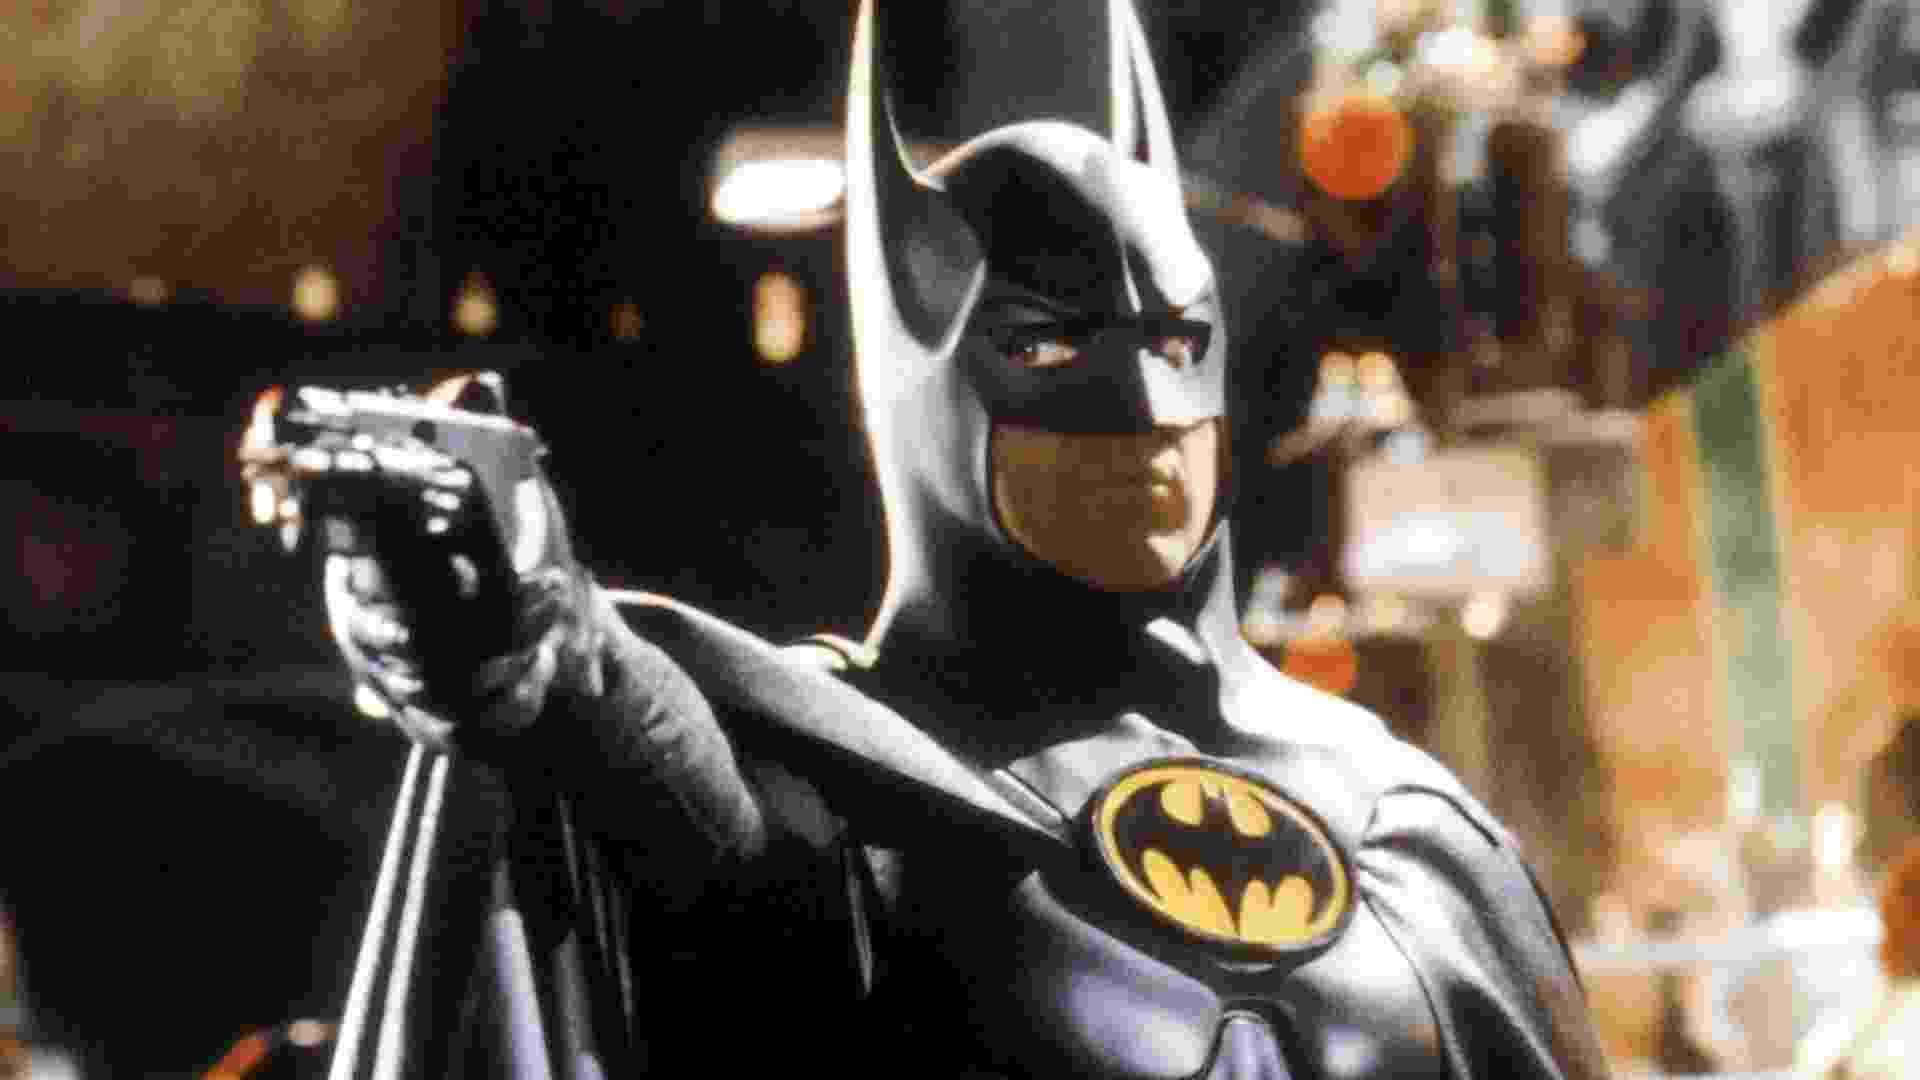 Batman - Warner Bros/Everett Collection